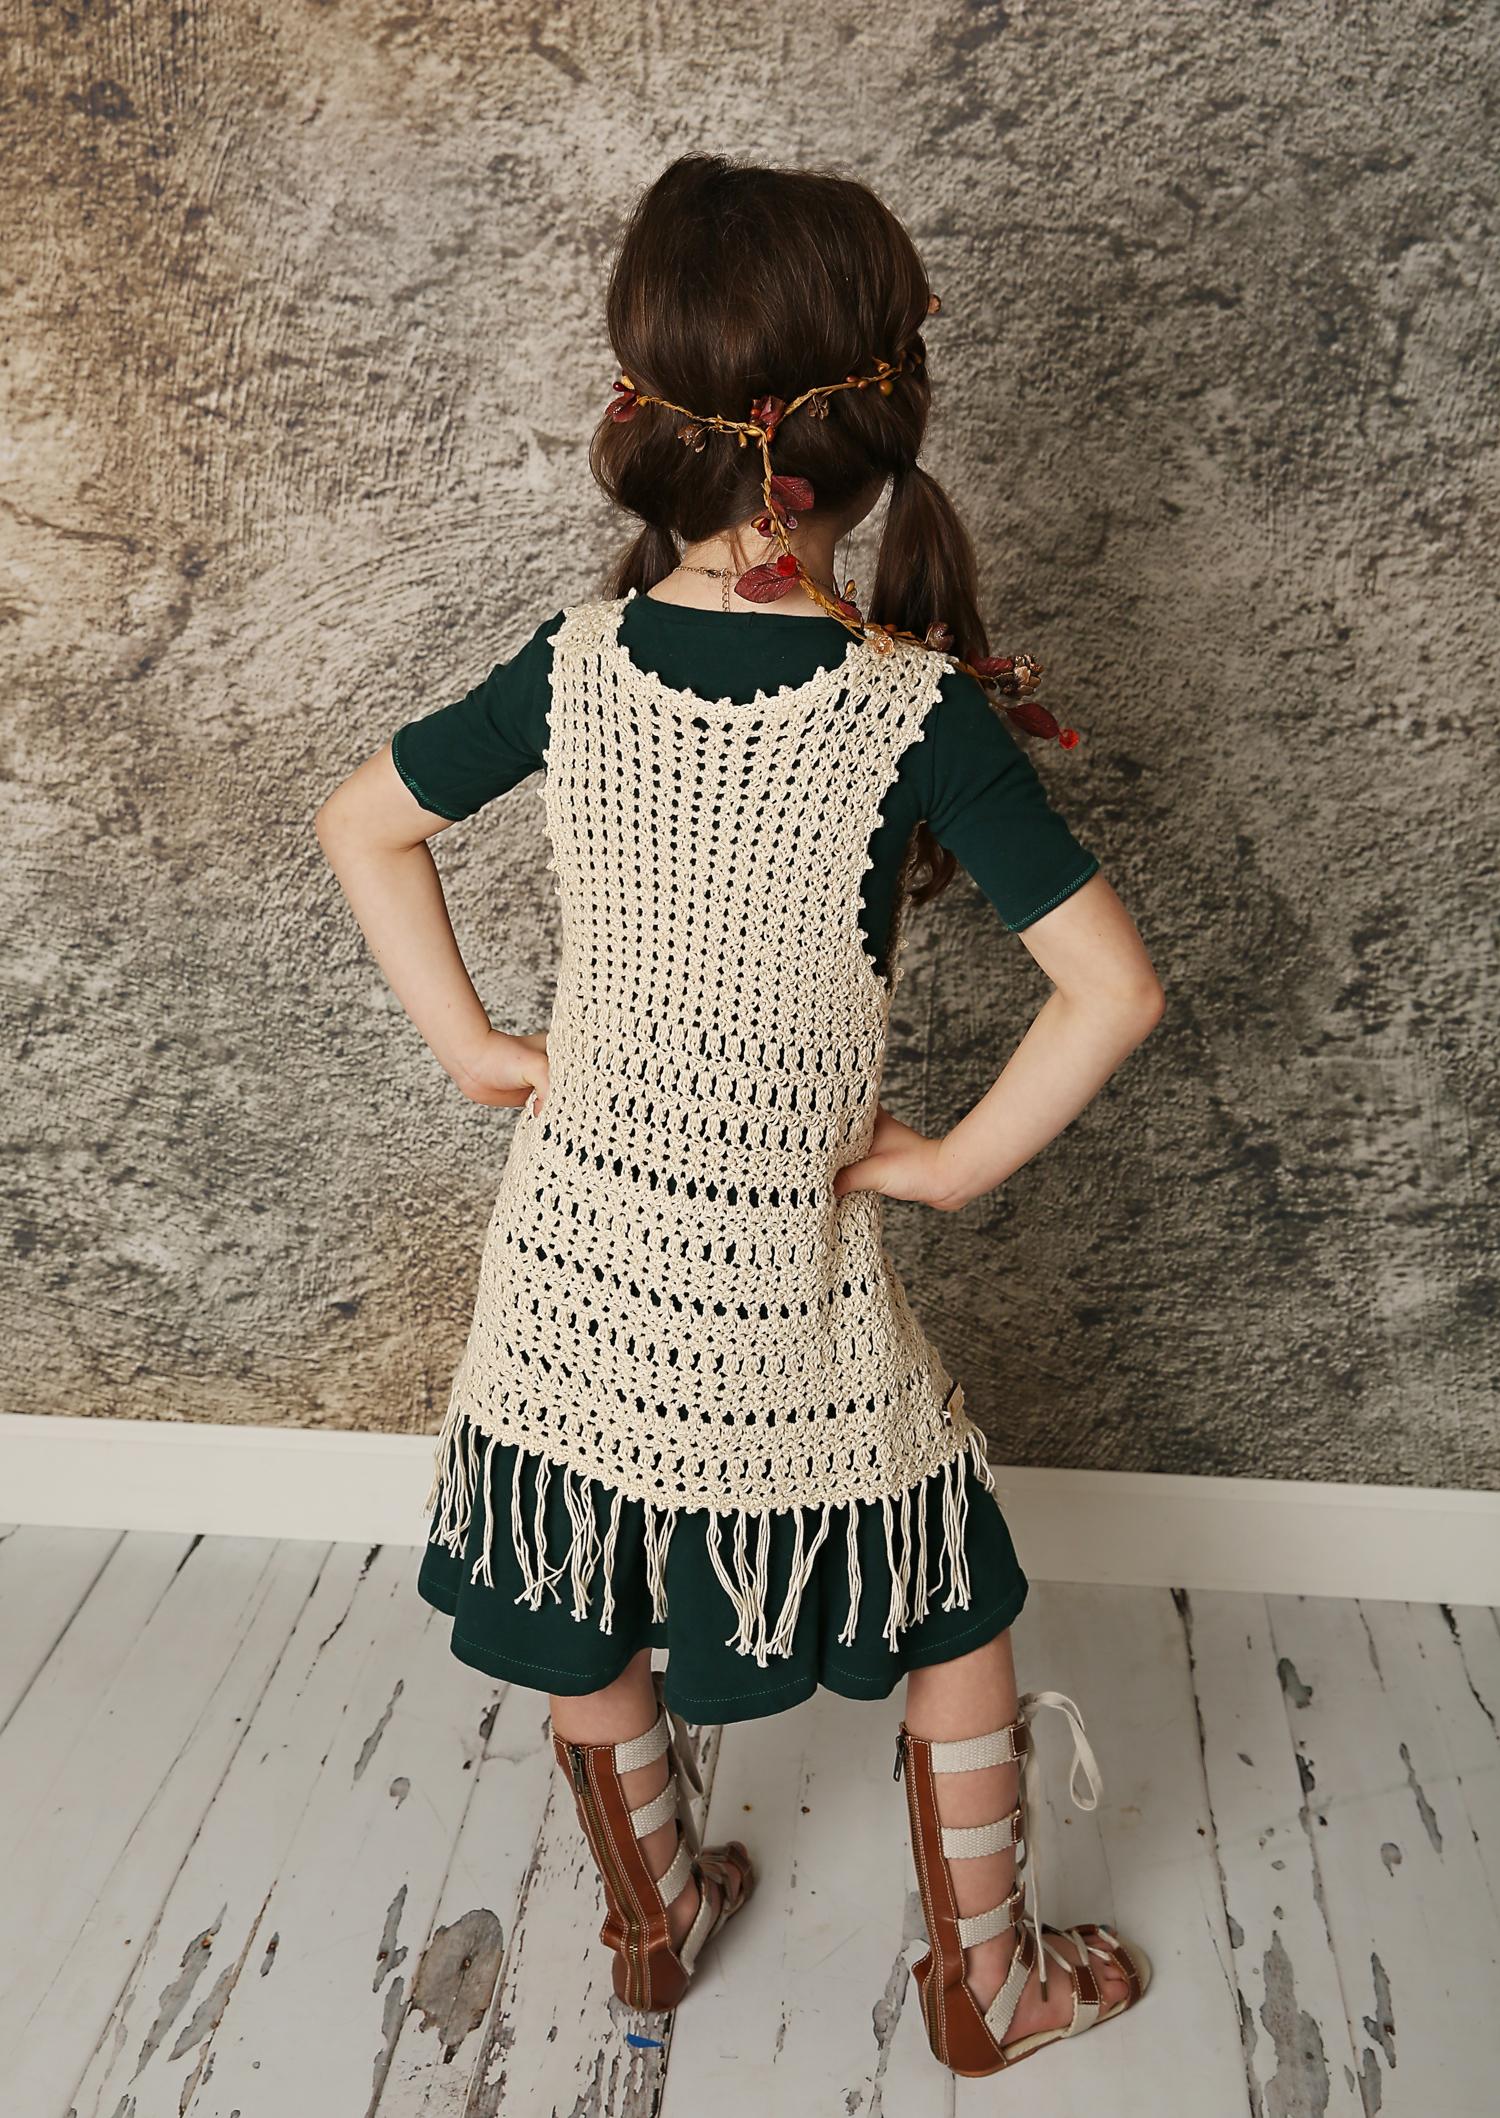 Boho Fringe Vest 600 Crochet Garden Boutique Quality Patterns